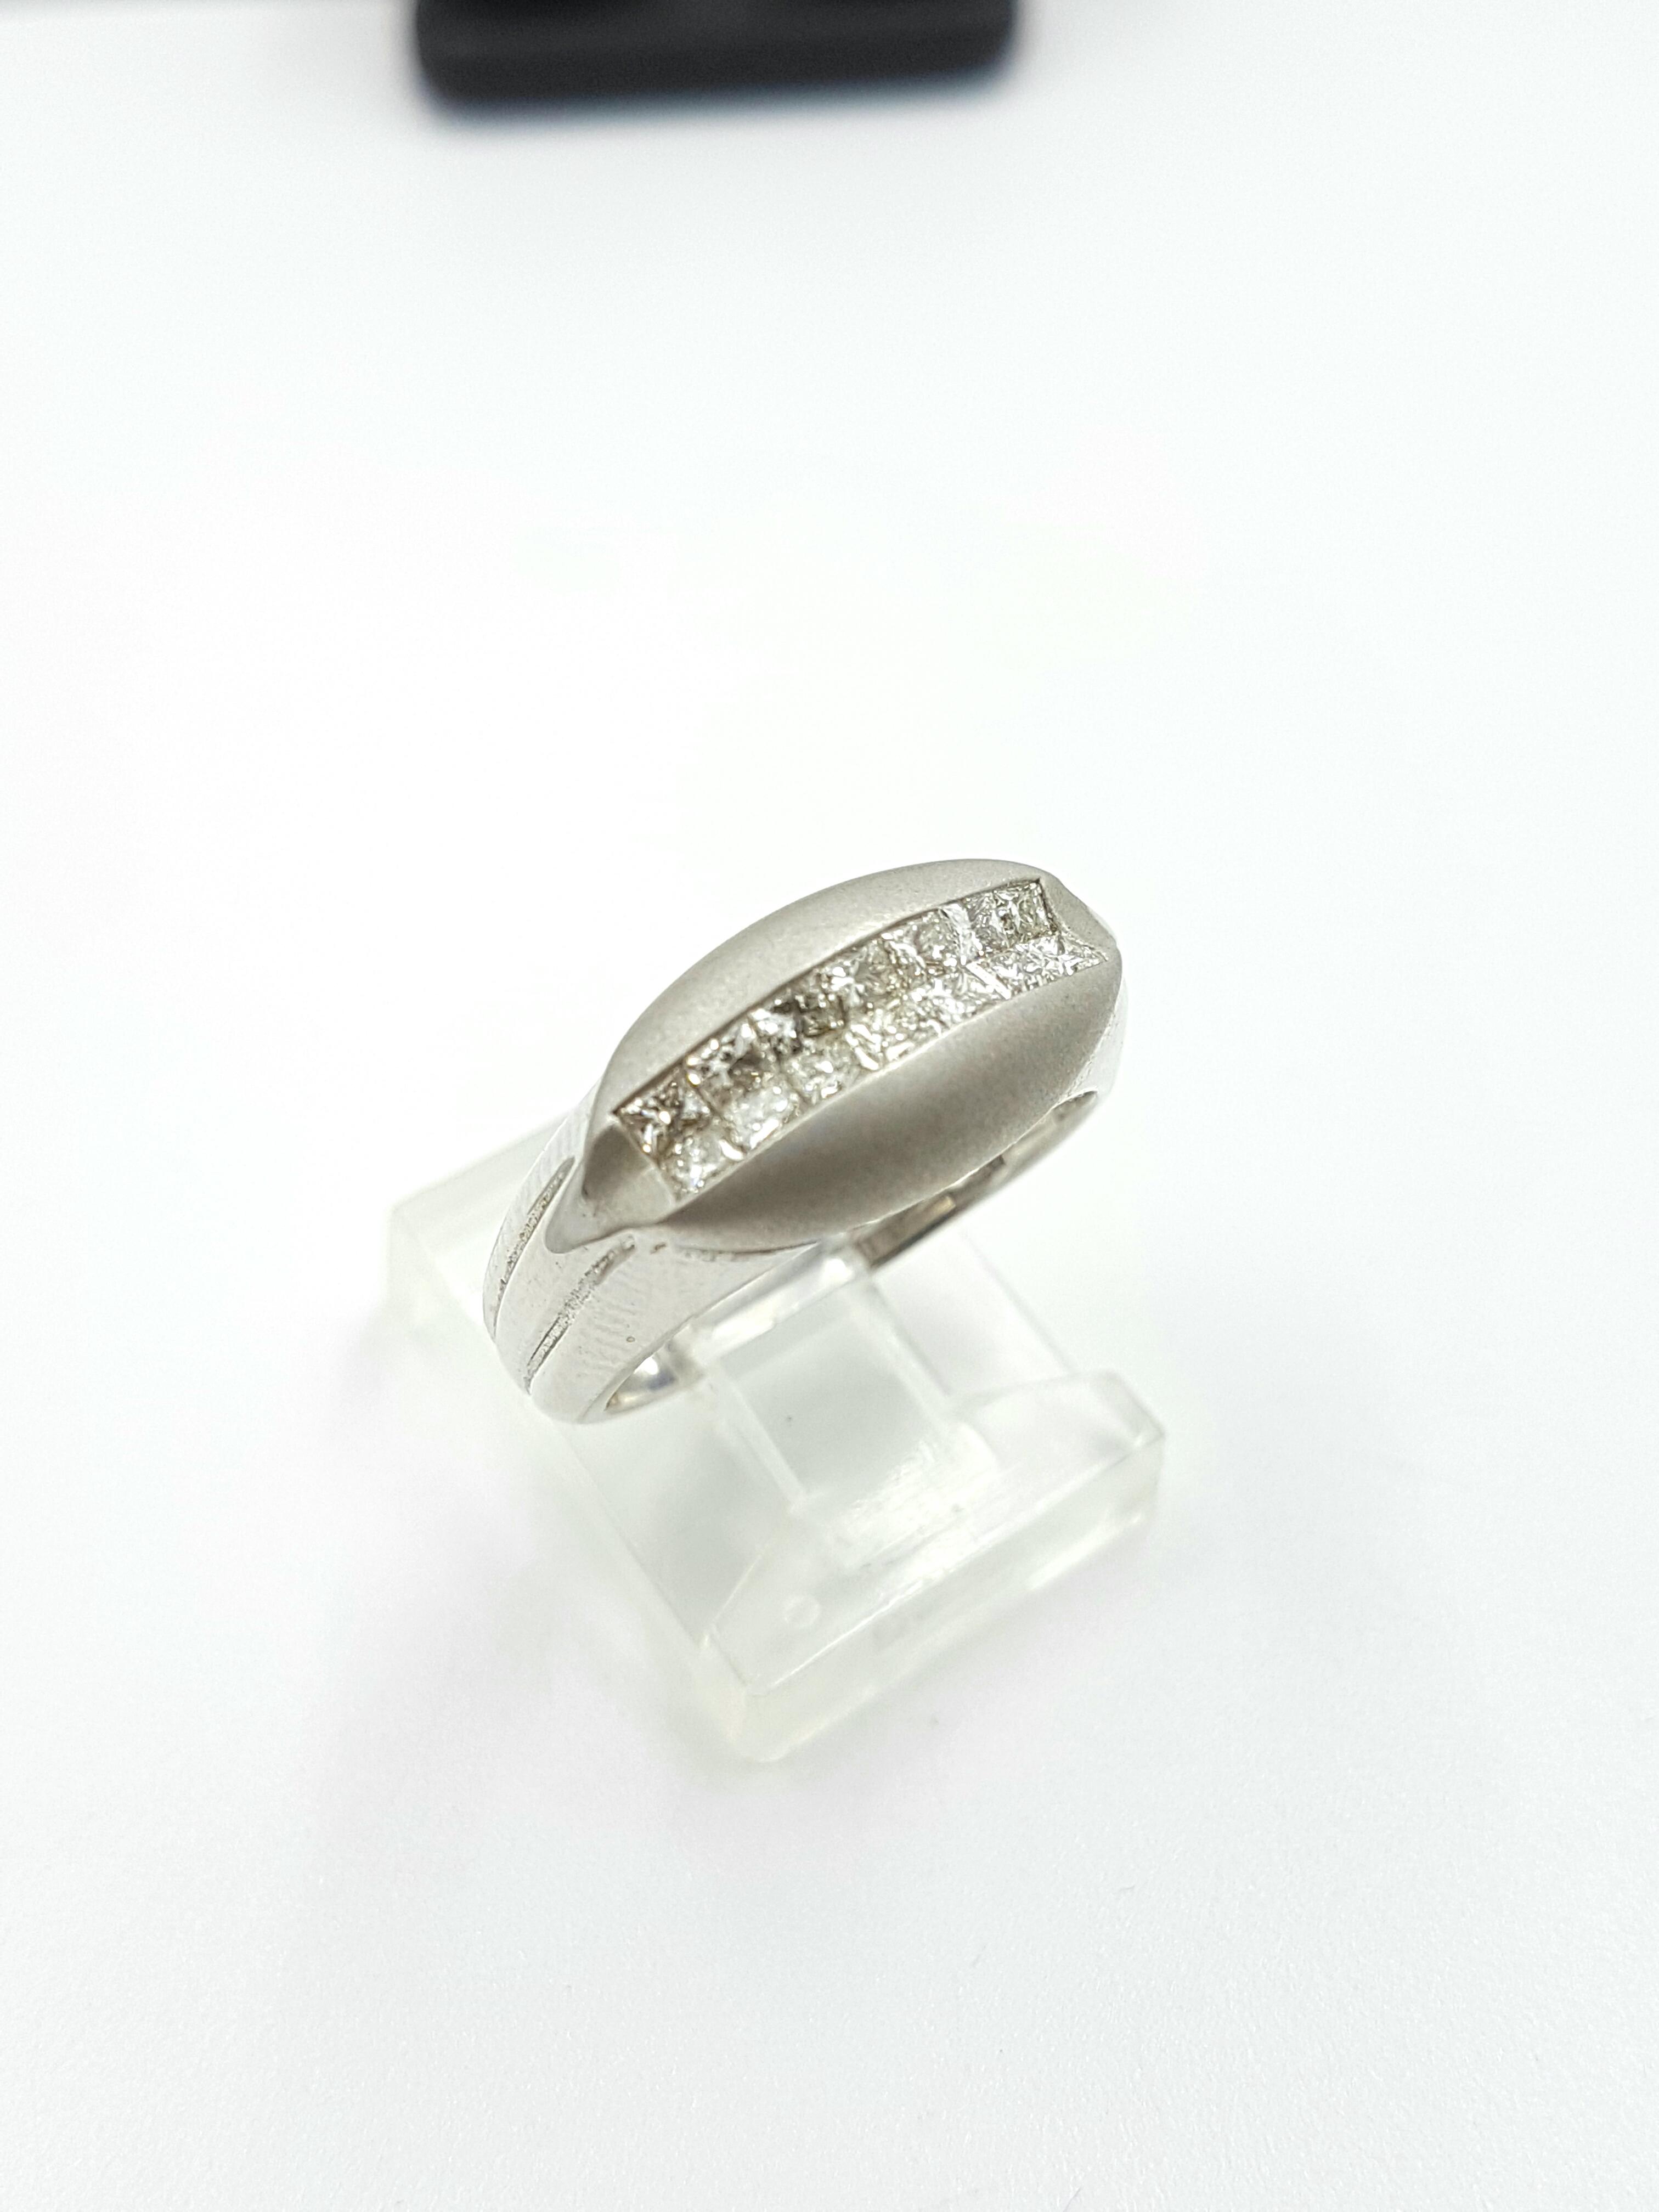 18K White Gold 0.65ct Regular Price $7560 SALE $1750 Ref: FN-3-405